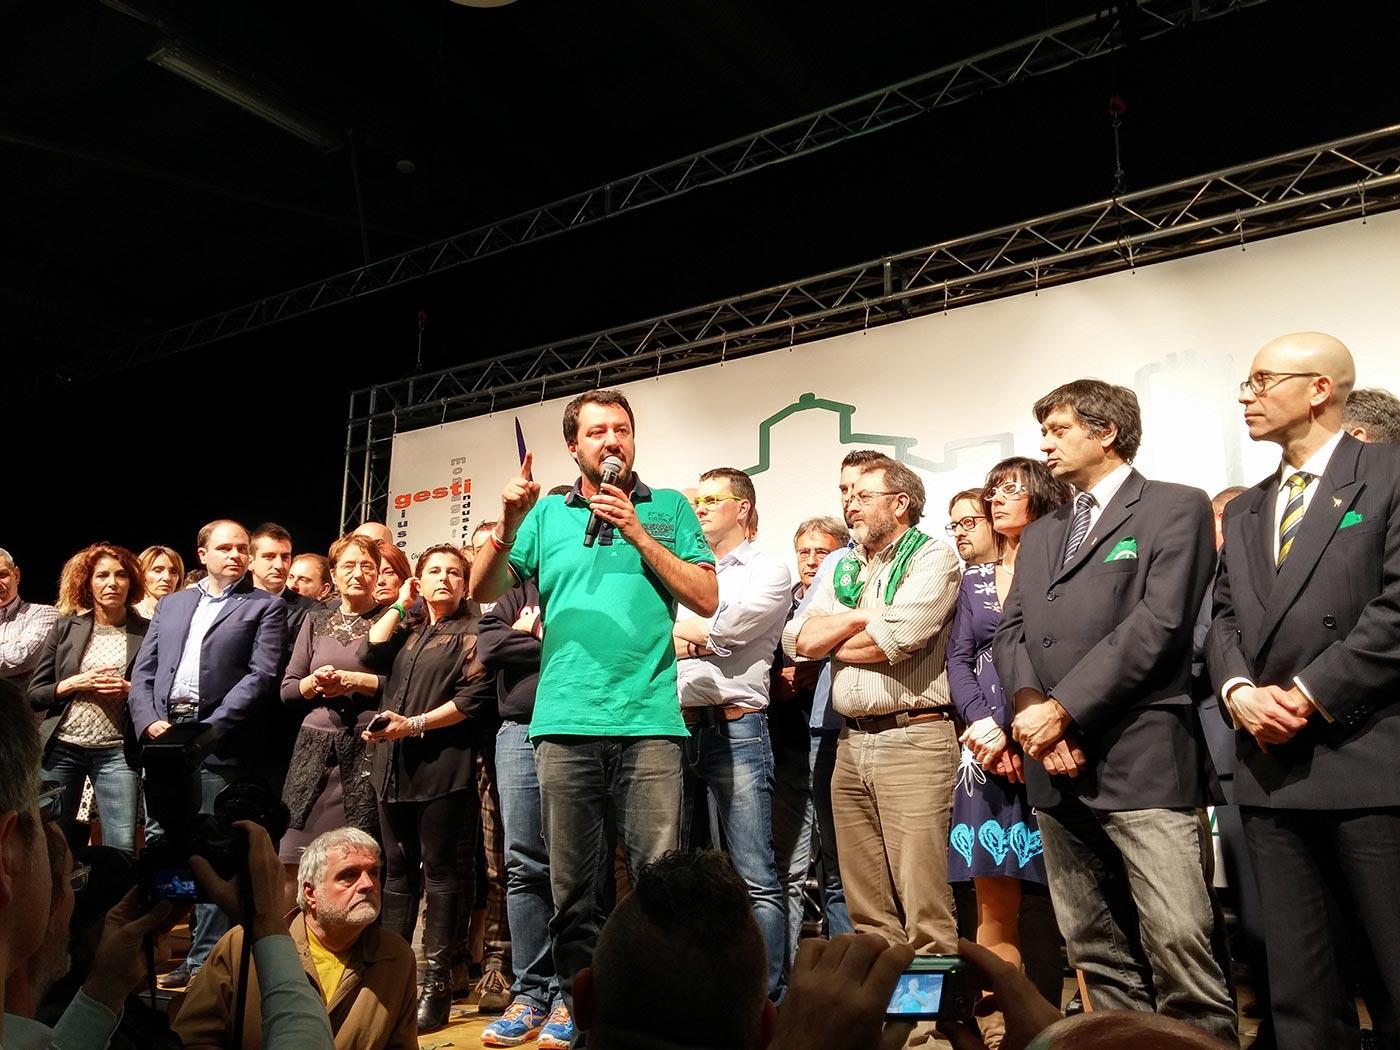 Matteo Salvini è assenteista anche in Consiglio Comunale